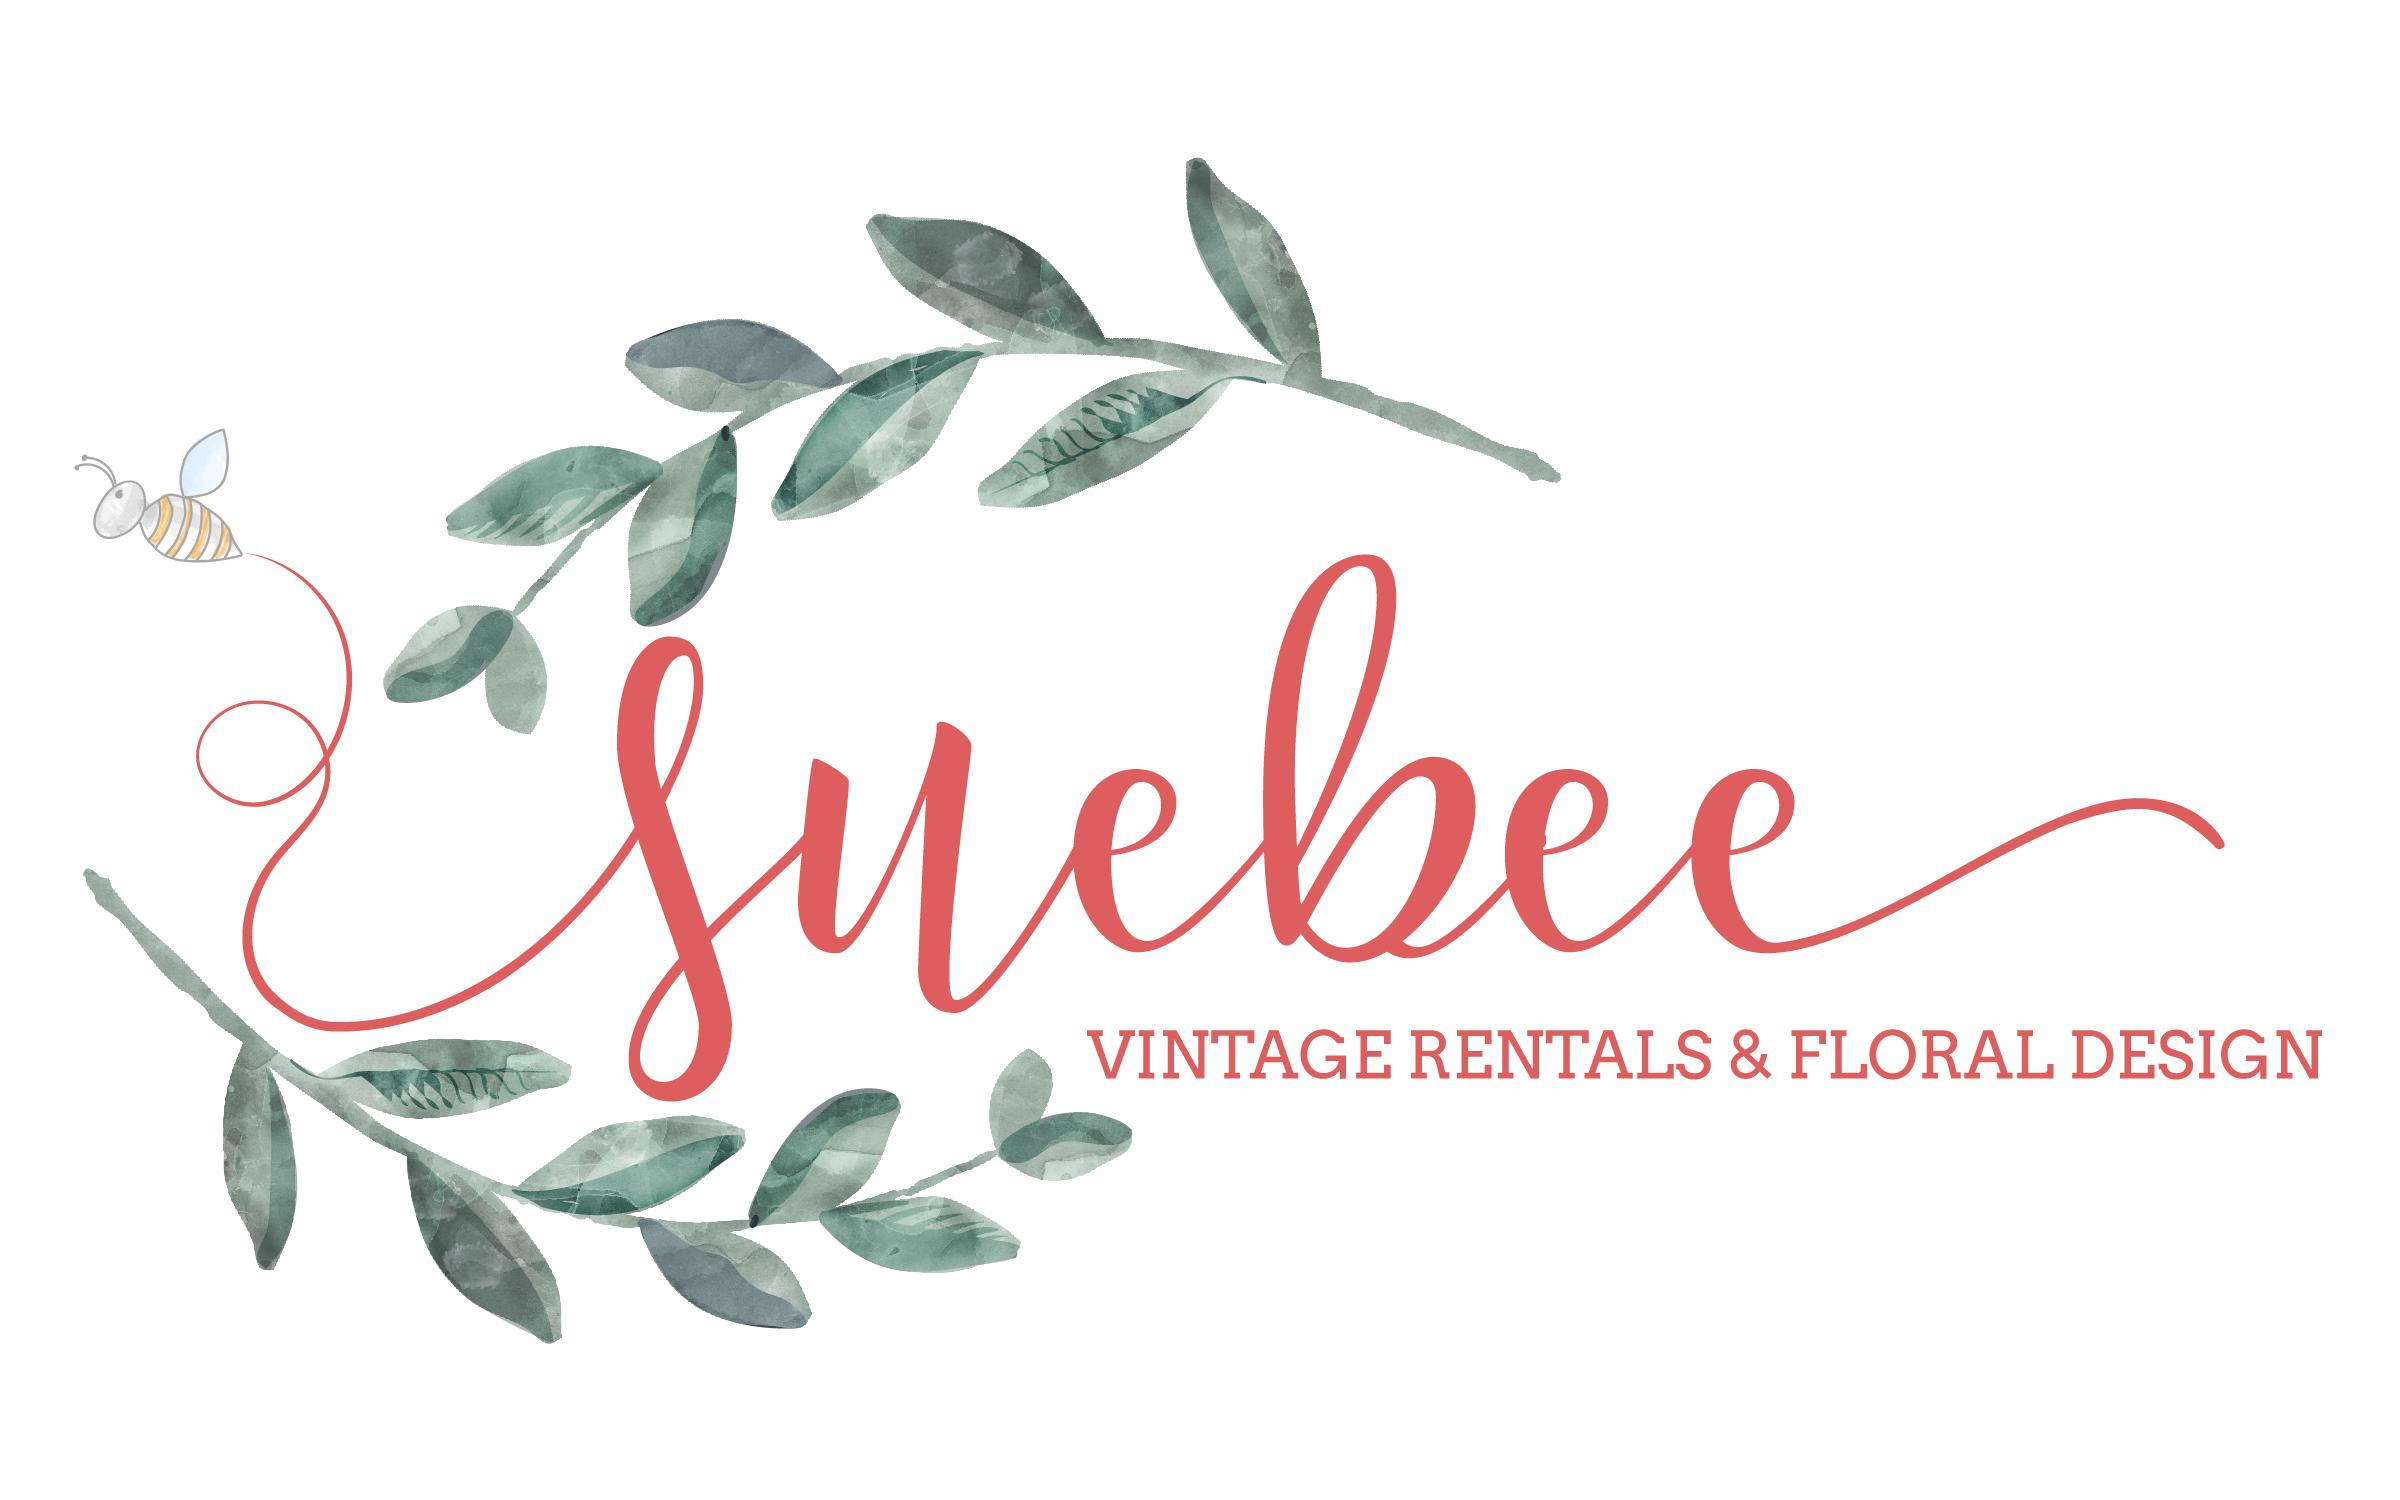 SueBee Vintage Rentals & Floral Design2.jpg